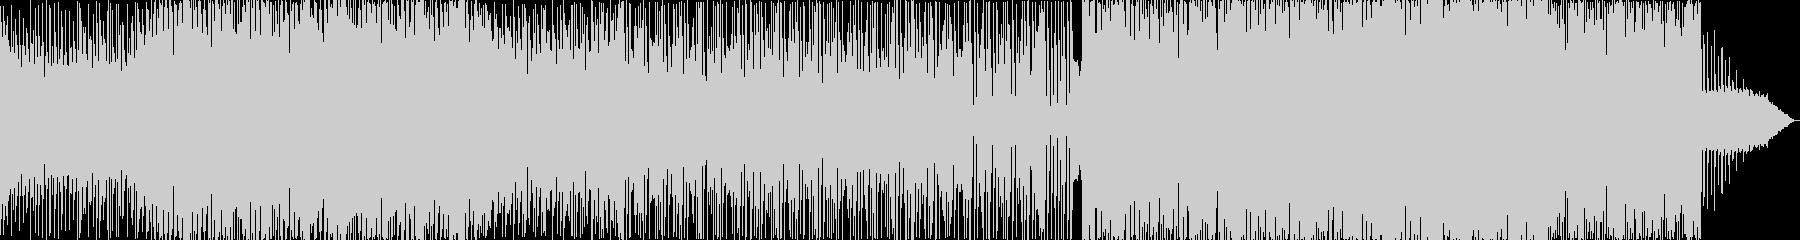 BGM_トランスの未再生の波形